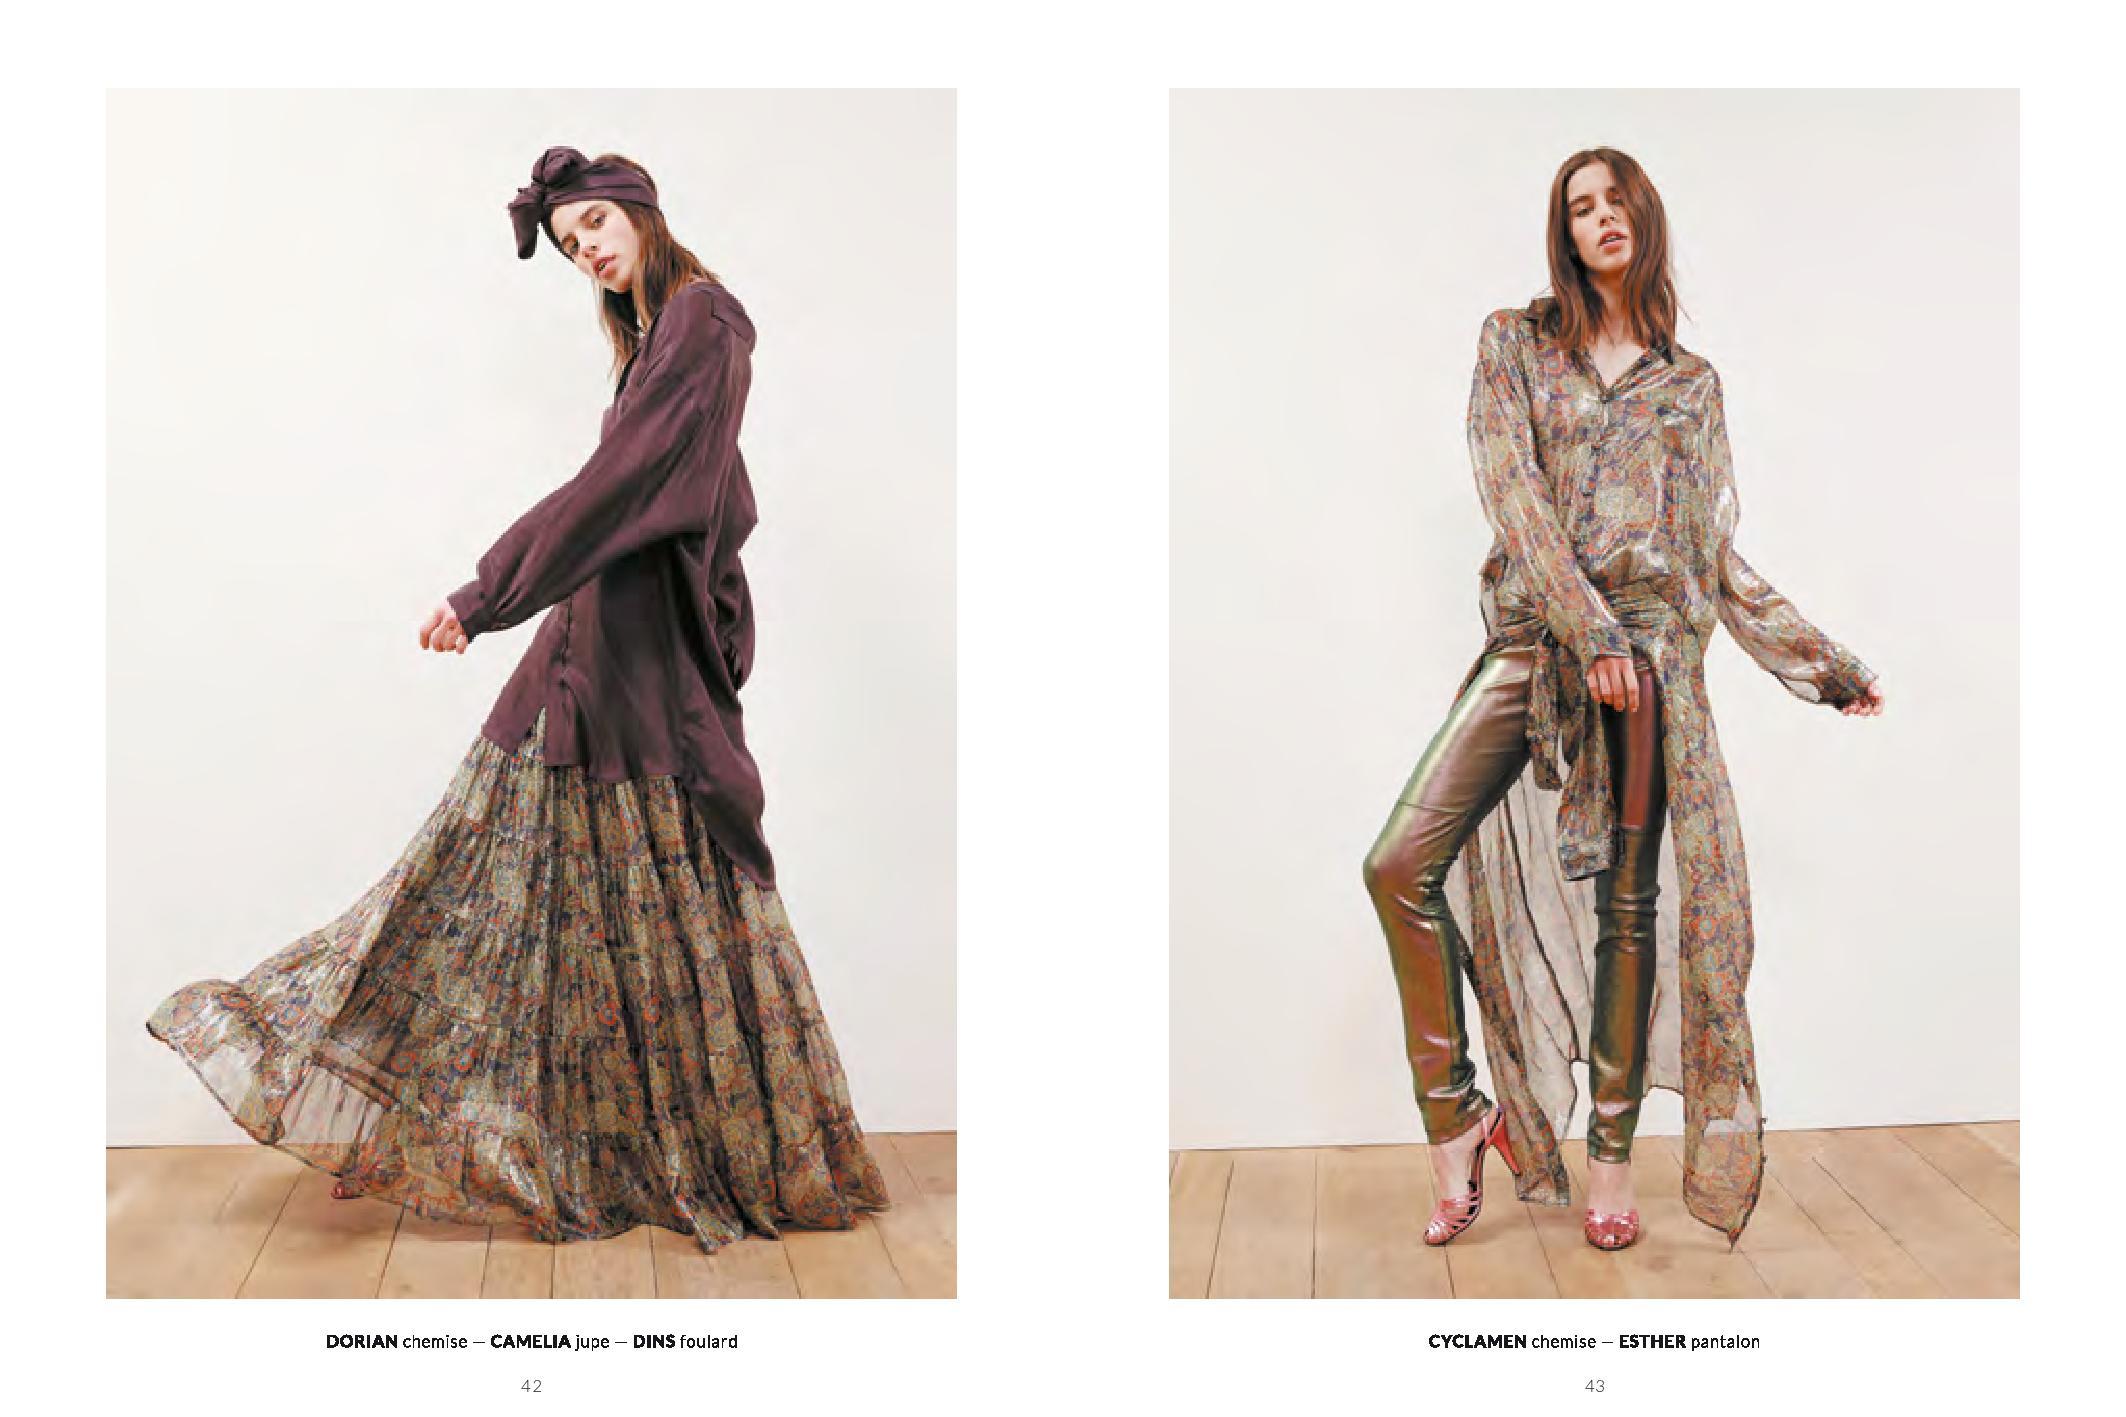 ab_md_lookbook_mes_demoiselles_paris_web_dresscode-page-024.jpg